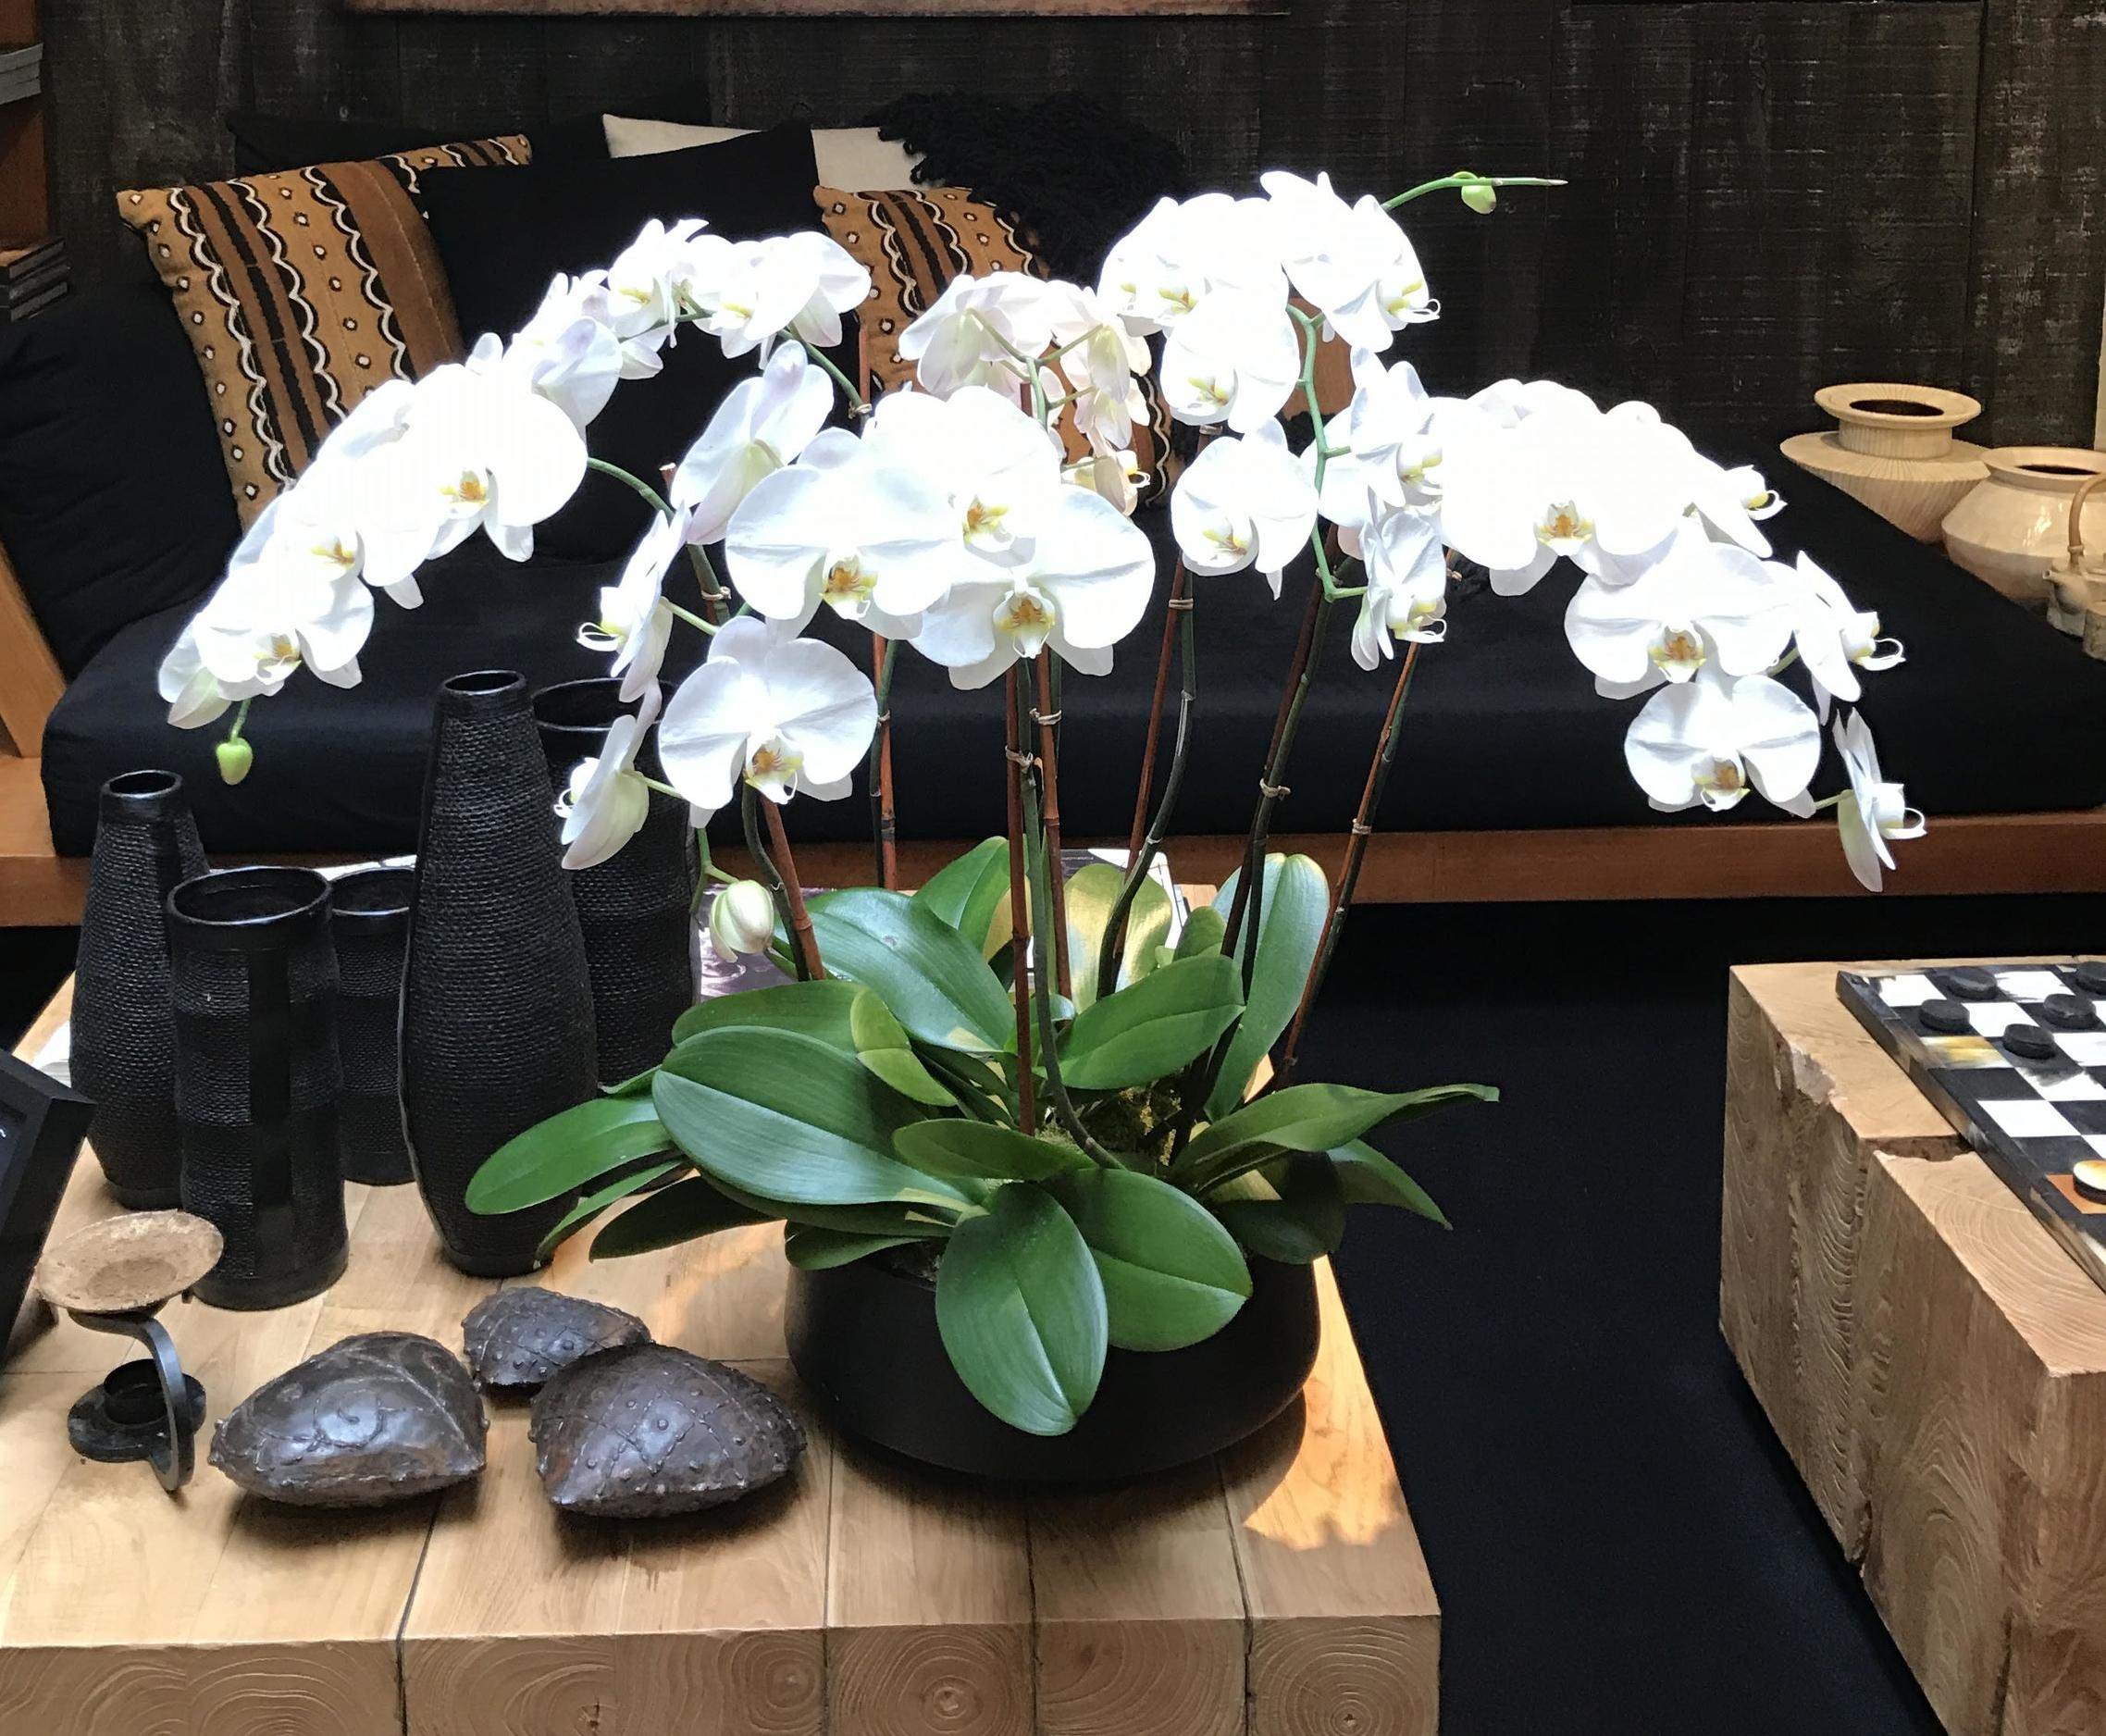 Floreal_orchidpic3.jpg